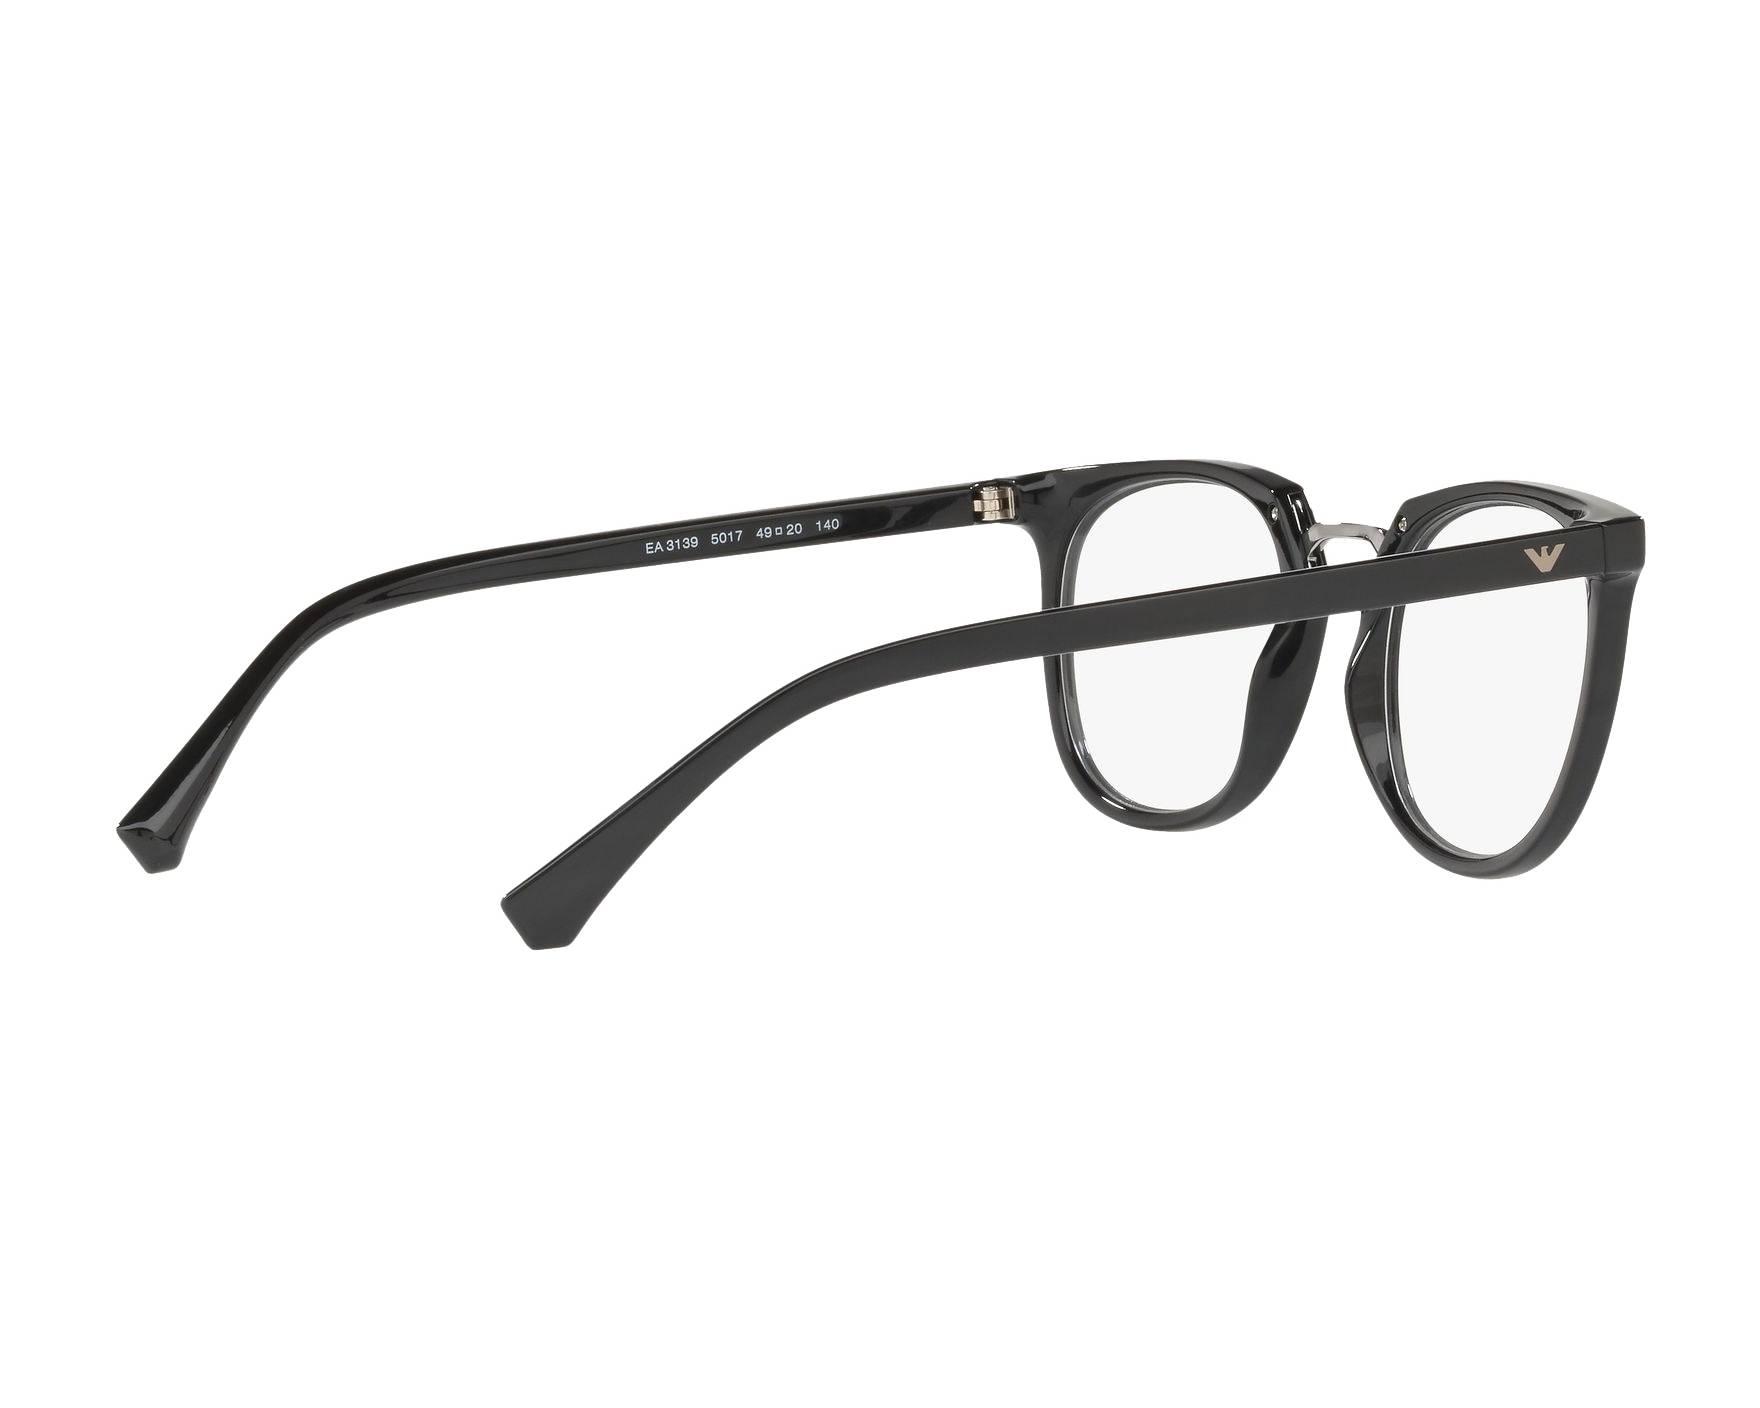 4a5fa28a46f eyeglasses Emporio Armani EA-3139 5017 51-20 Black 360 degree view 9